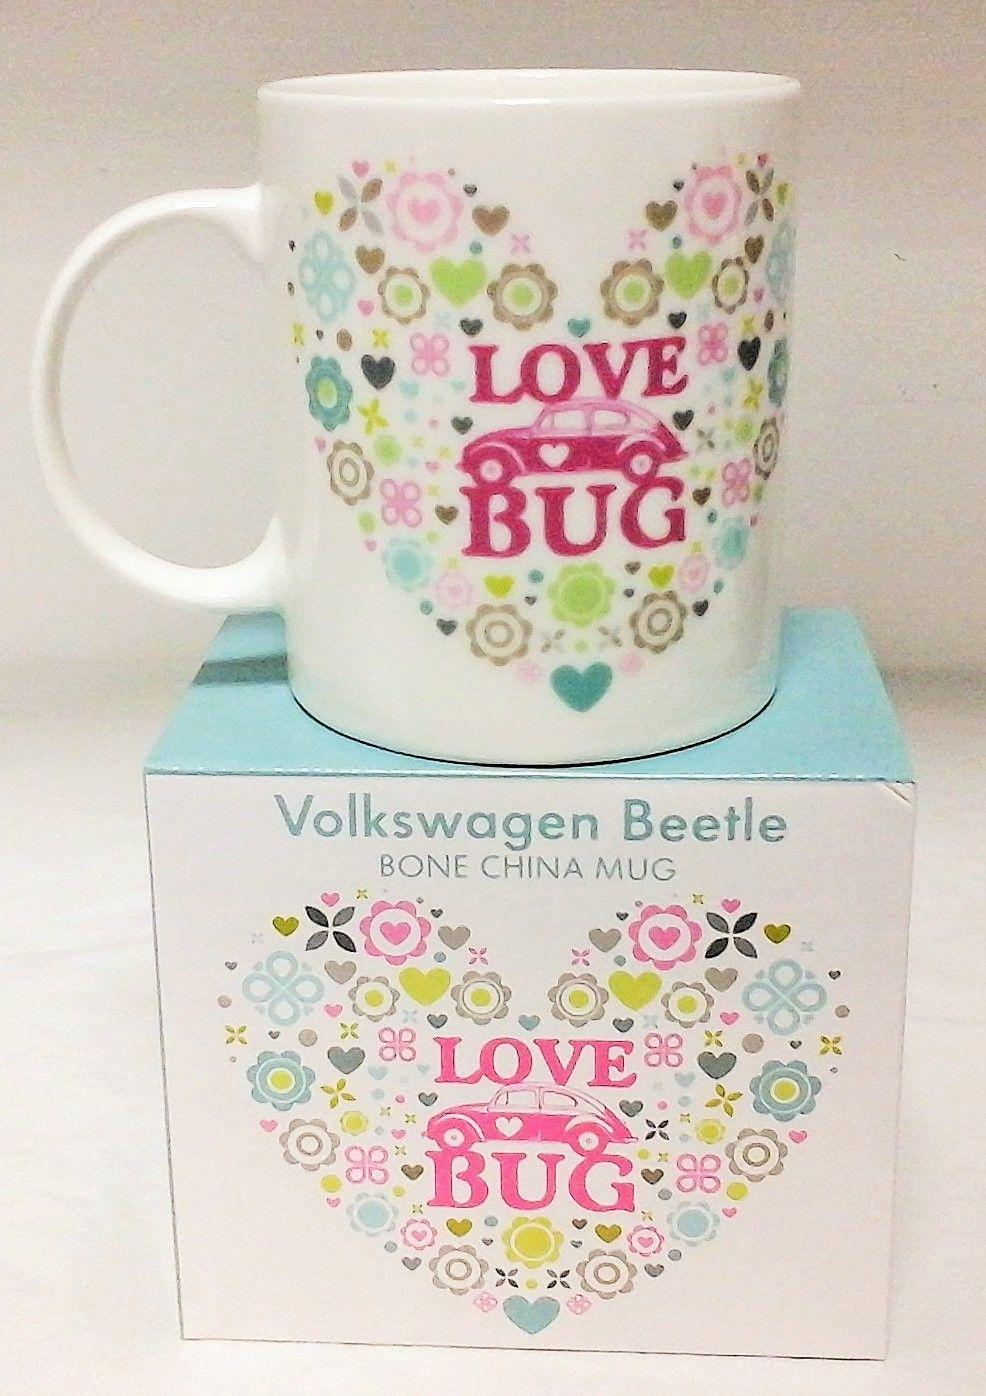 VW Beetle Love Bug Bone China Mug Official Merchandising by Elgate 68155